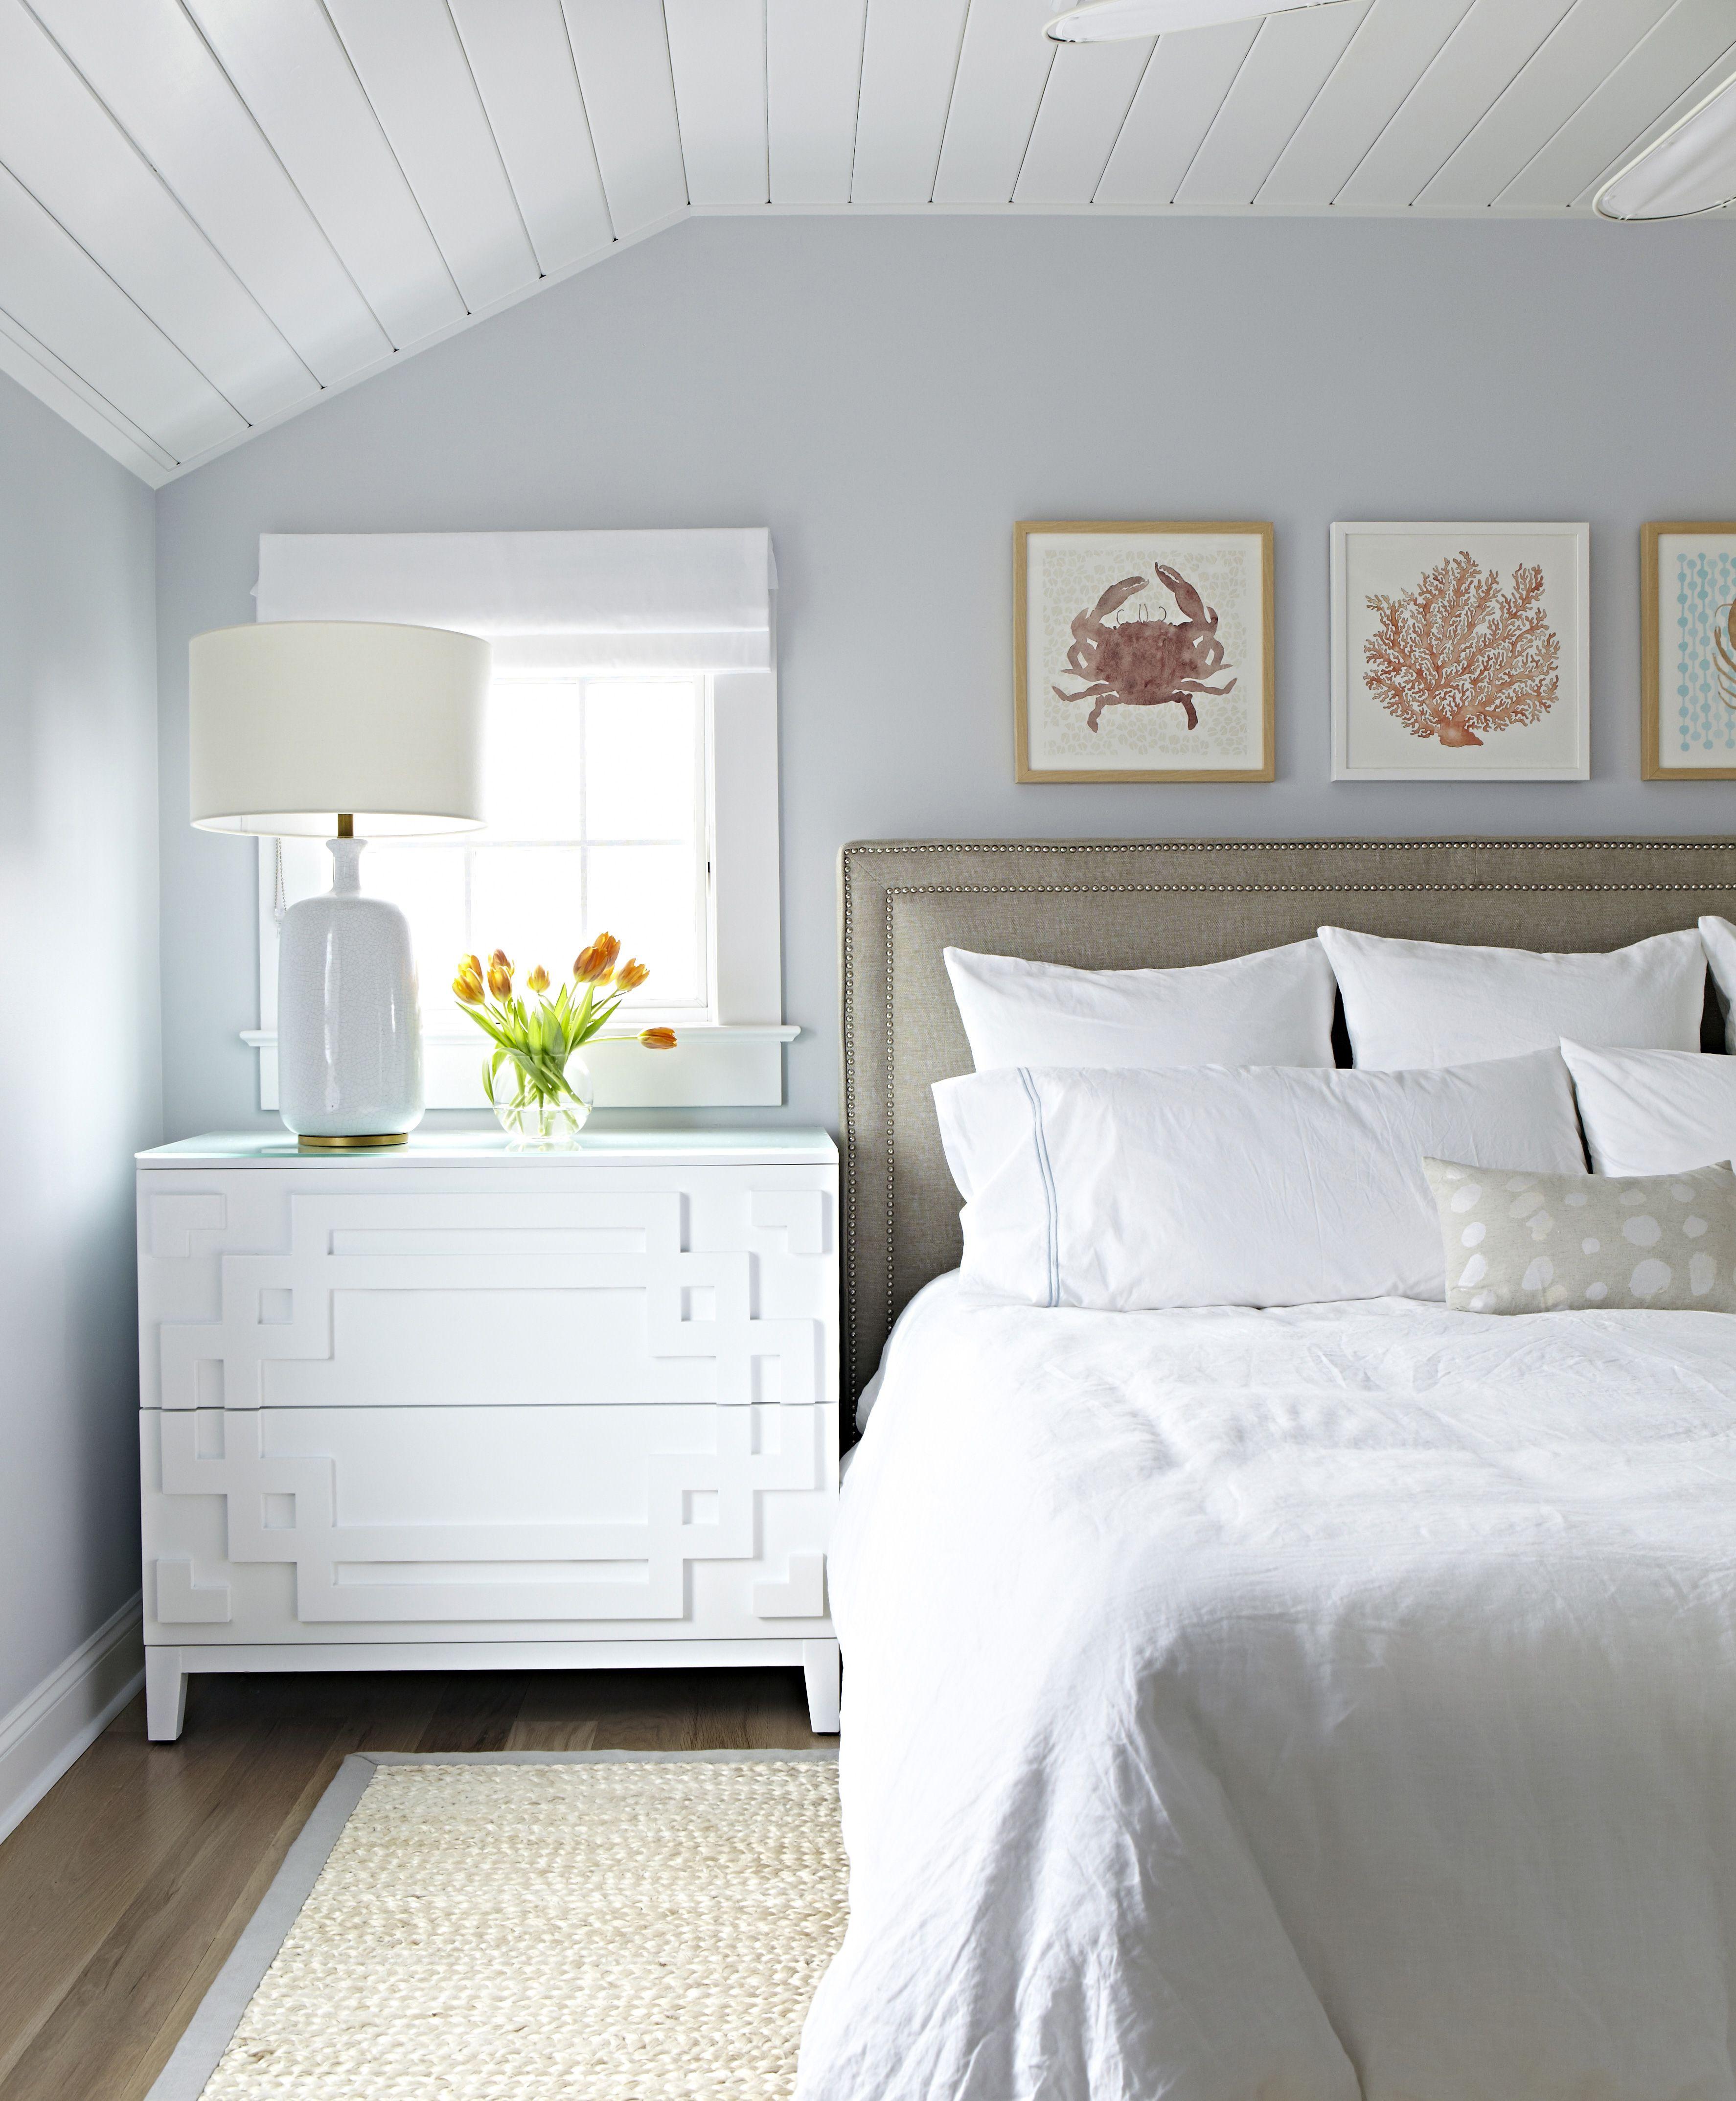 bay head beach bungalow coastal prints chango co schlafzimmer bedroom. Black Bedroom Furniture Sets. Home Design Ideas